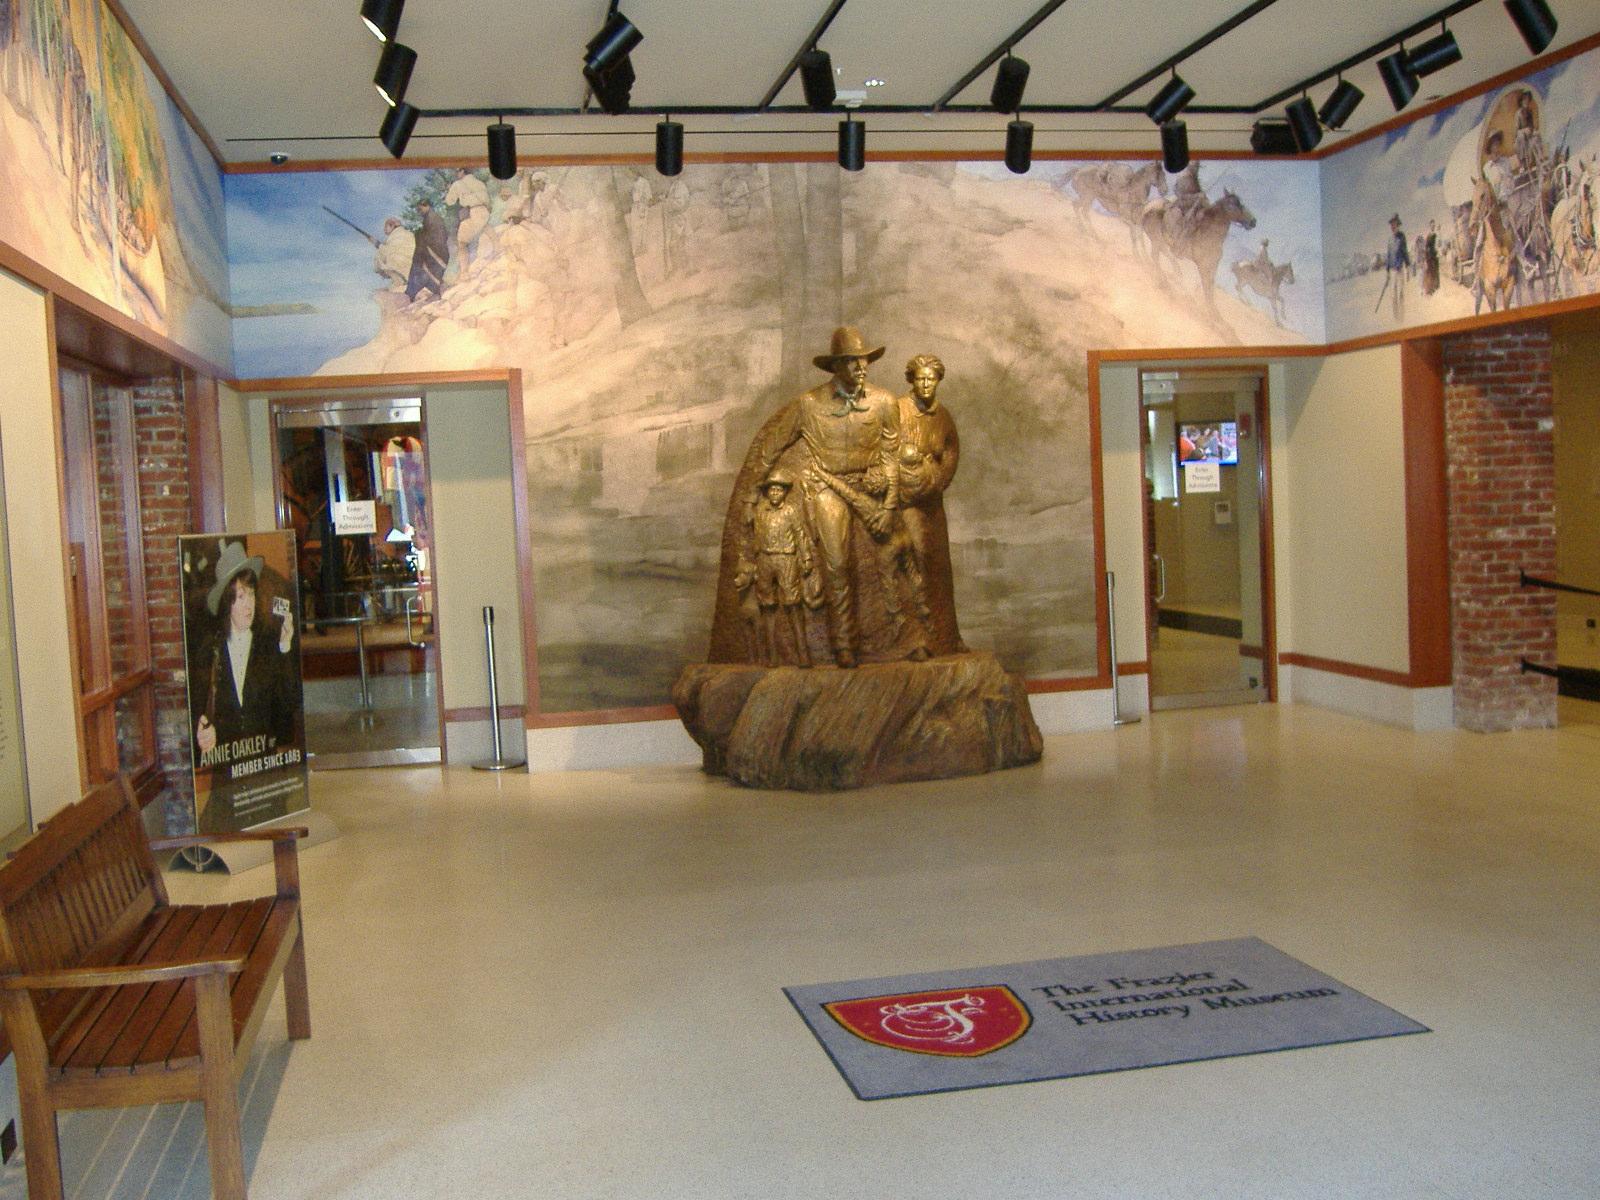 File:Frazier Museum Lobby.jpg - Wikimedia Commons